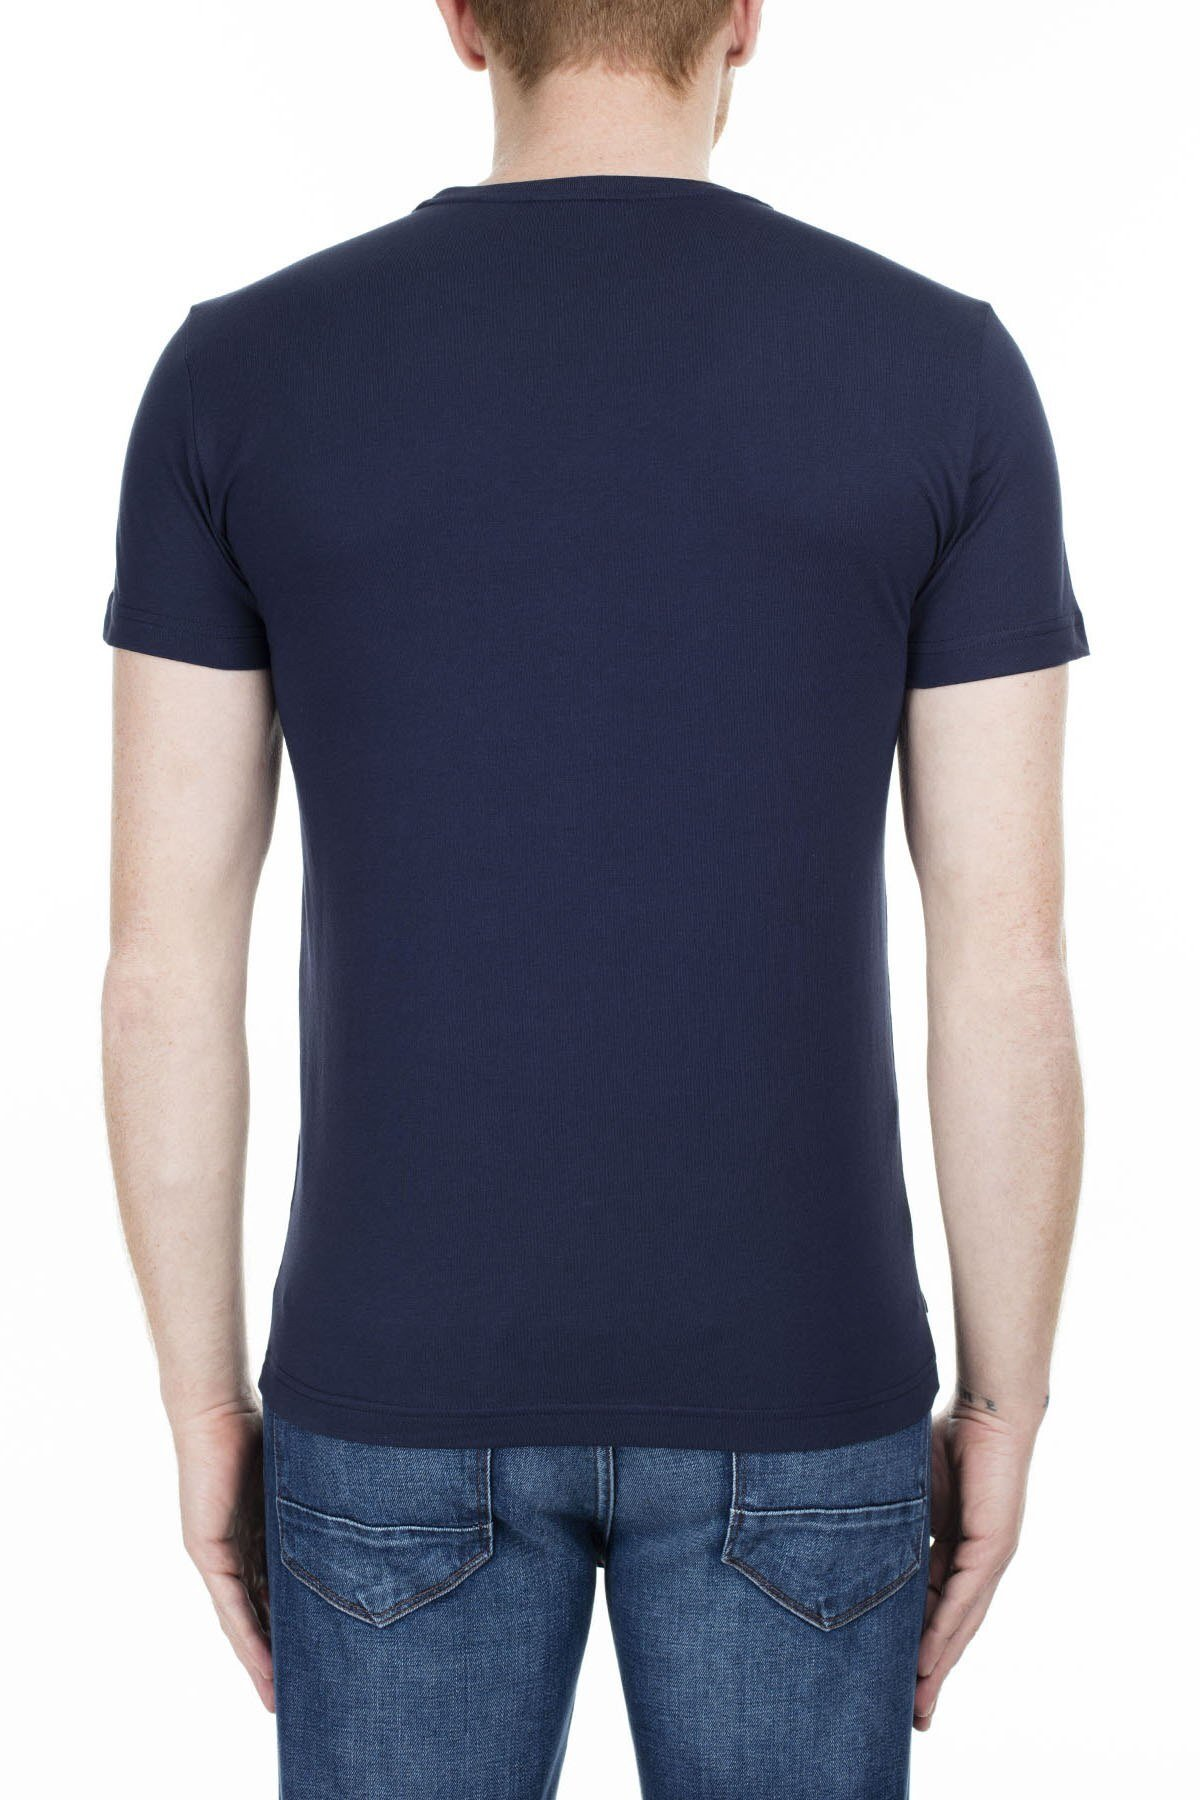 Lacoste Baskılı Bisiklet Yaka Erkek T Shirt TH0020 20L LACİVERT